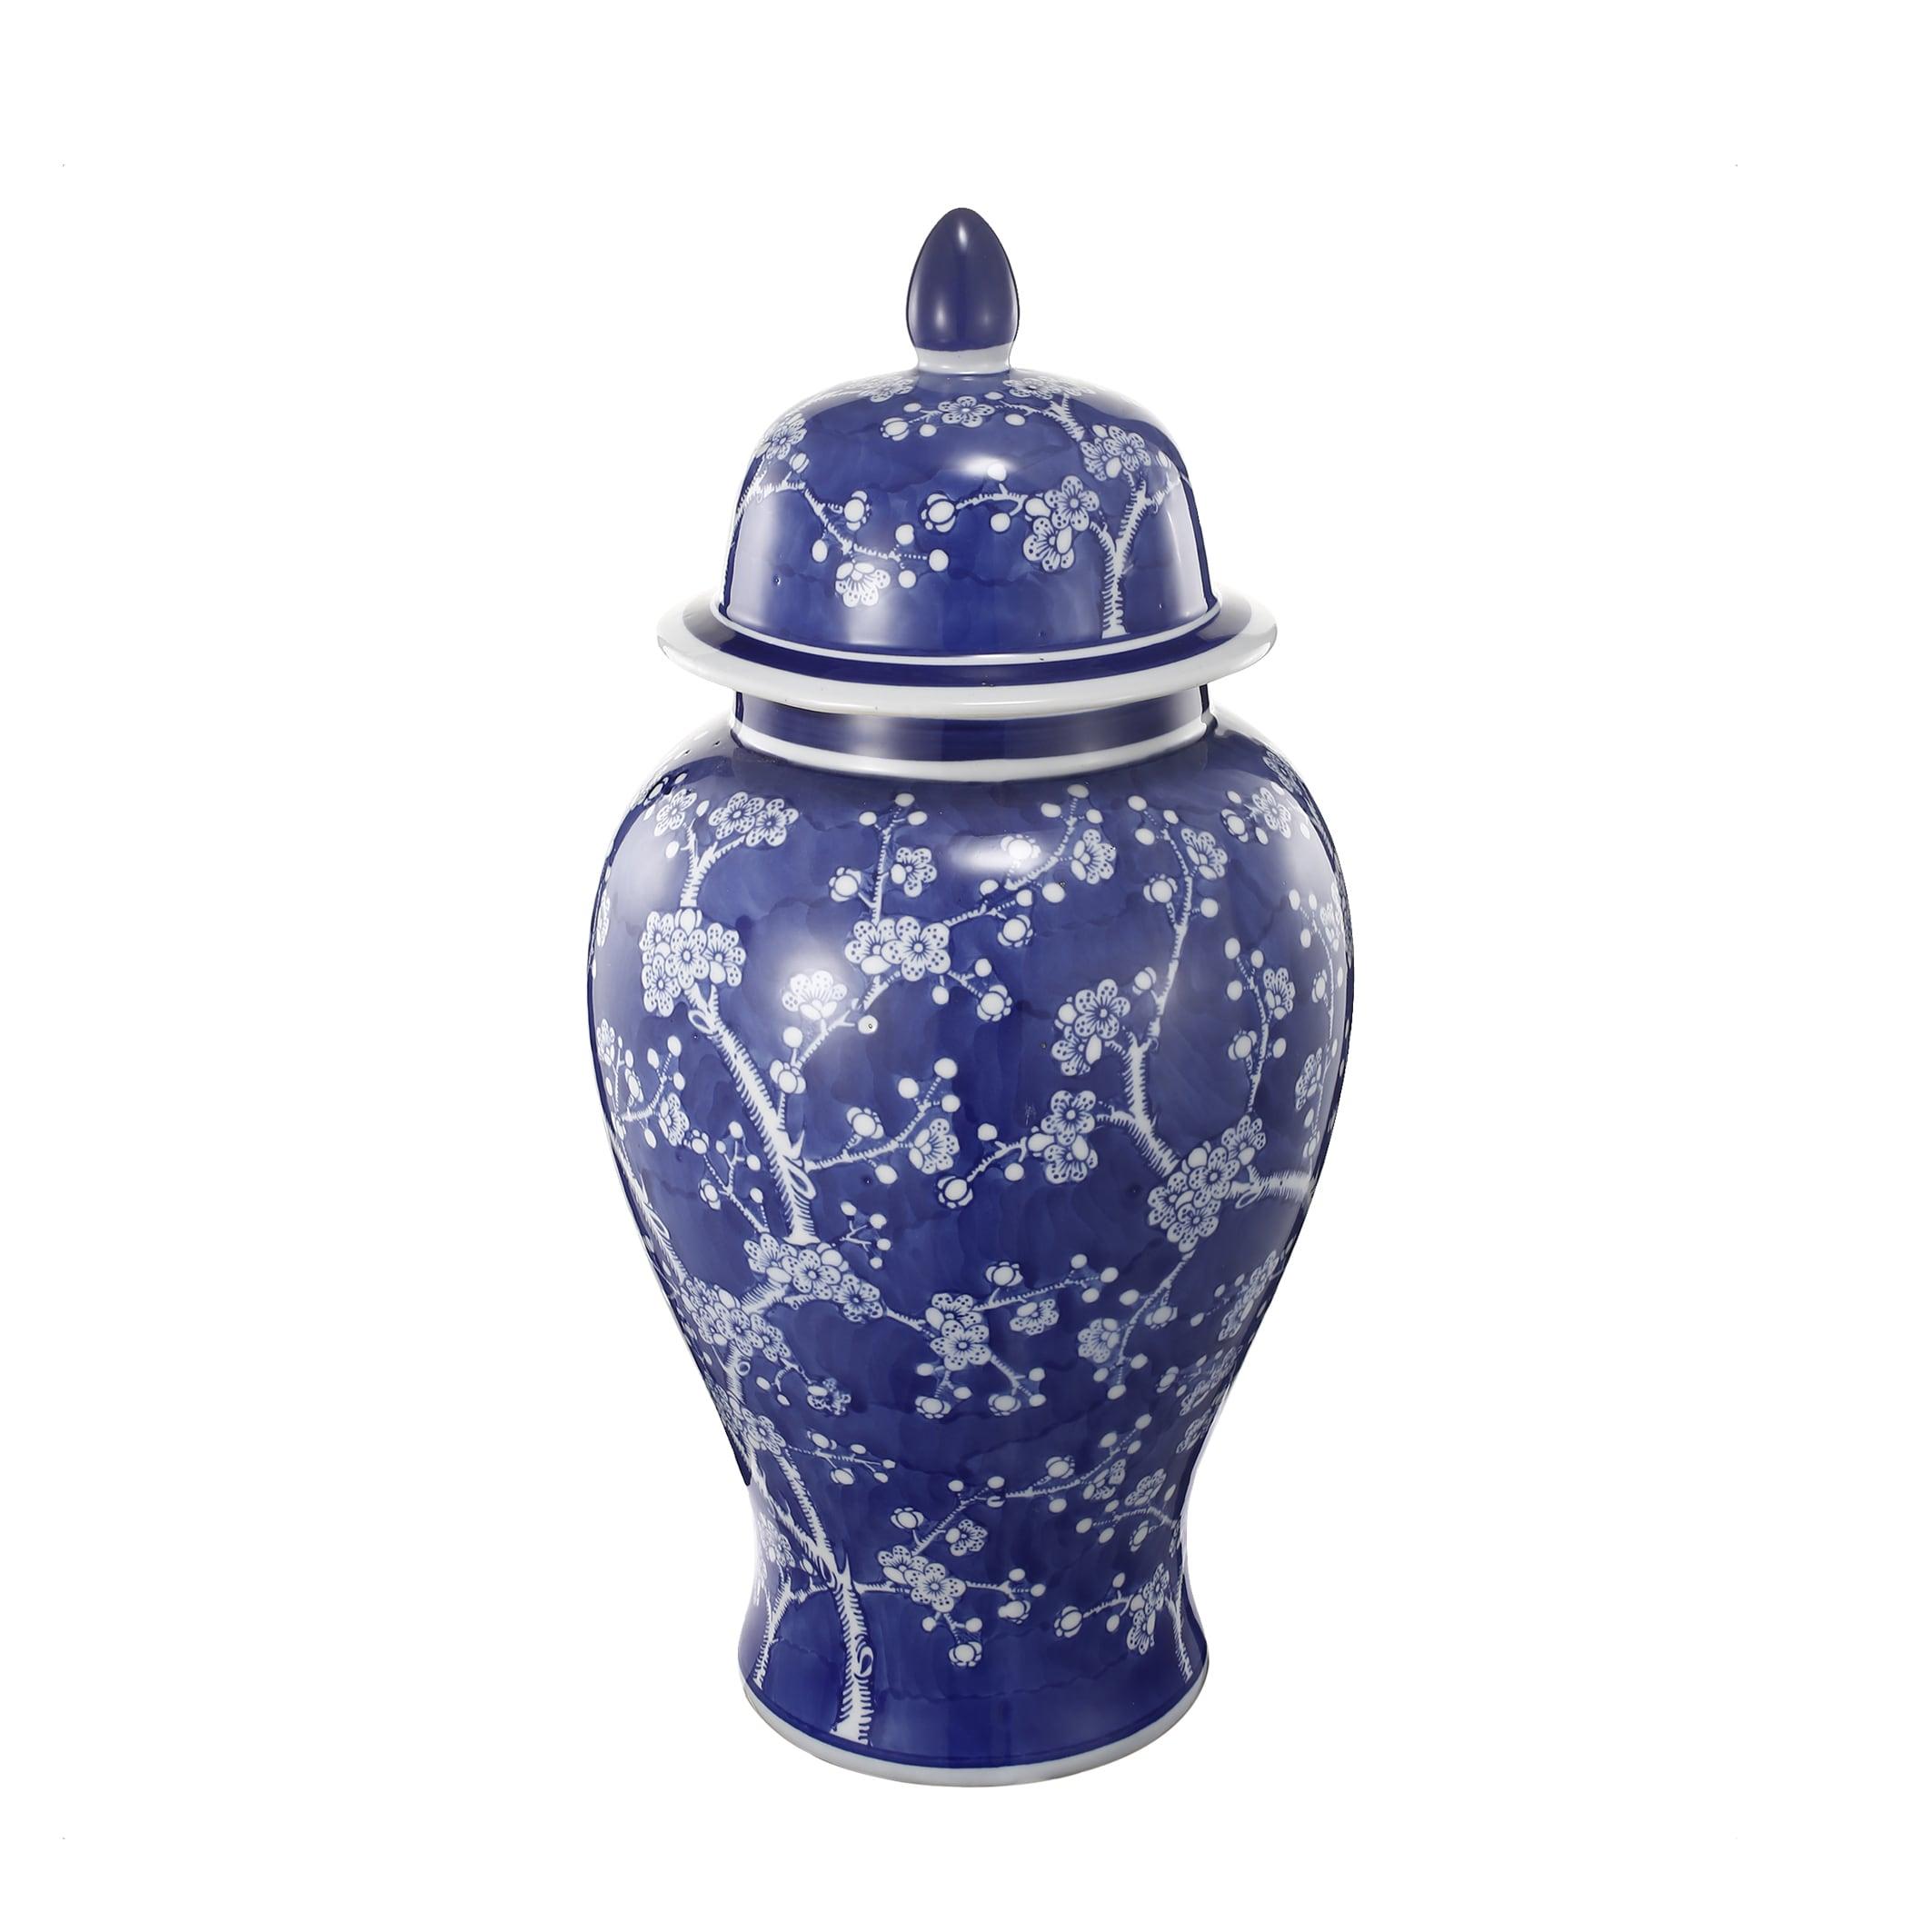 Indigo White Ceramic 9 5 Inch X 18 Ginger Jar Free Shipping Today 12037021